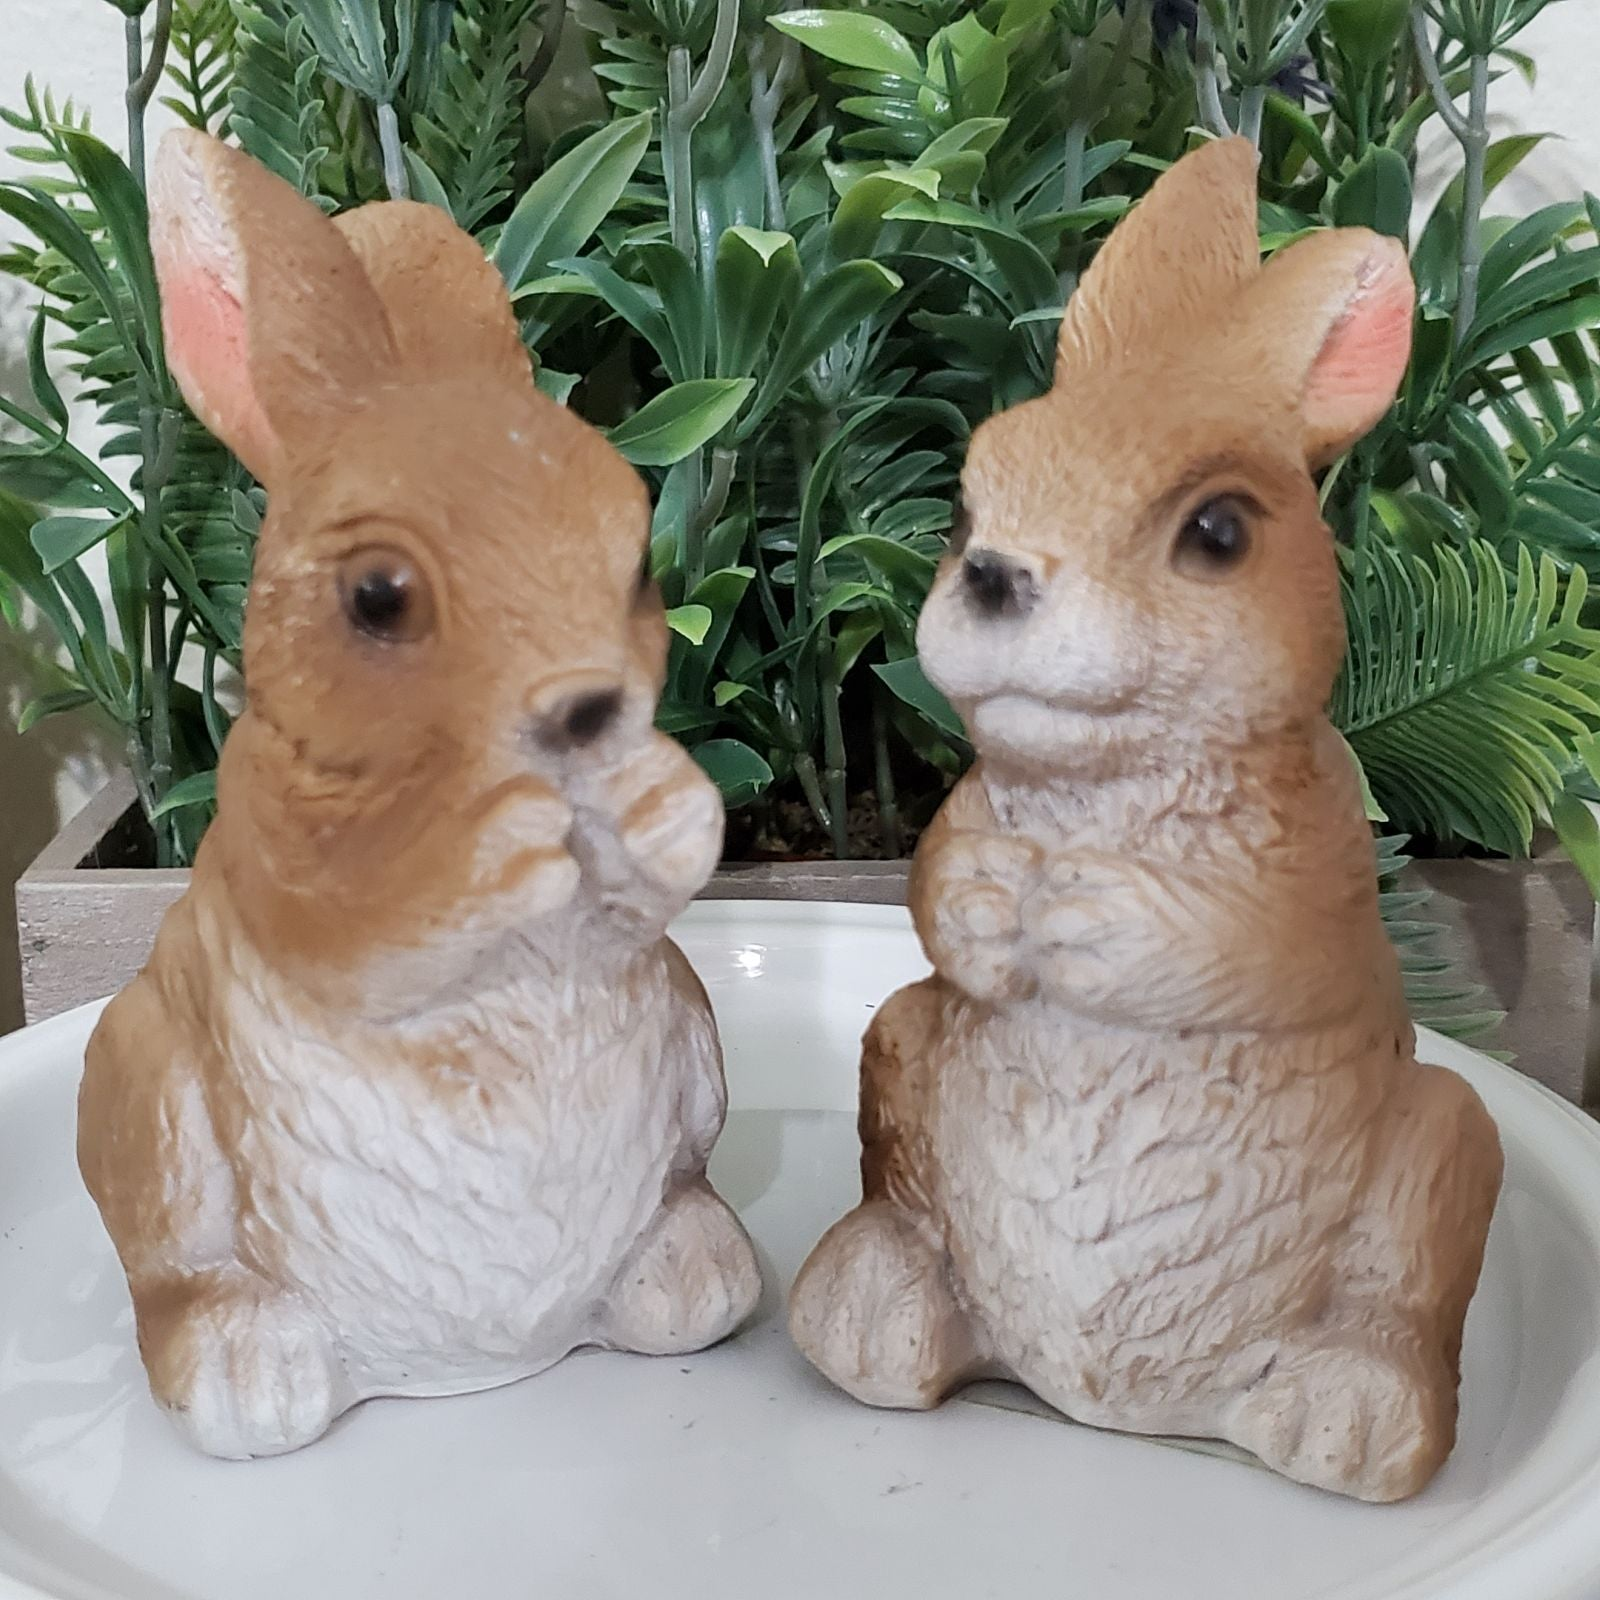 Adorable pair of bunnies